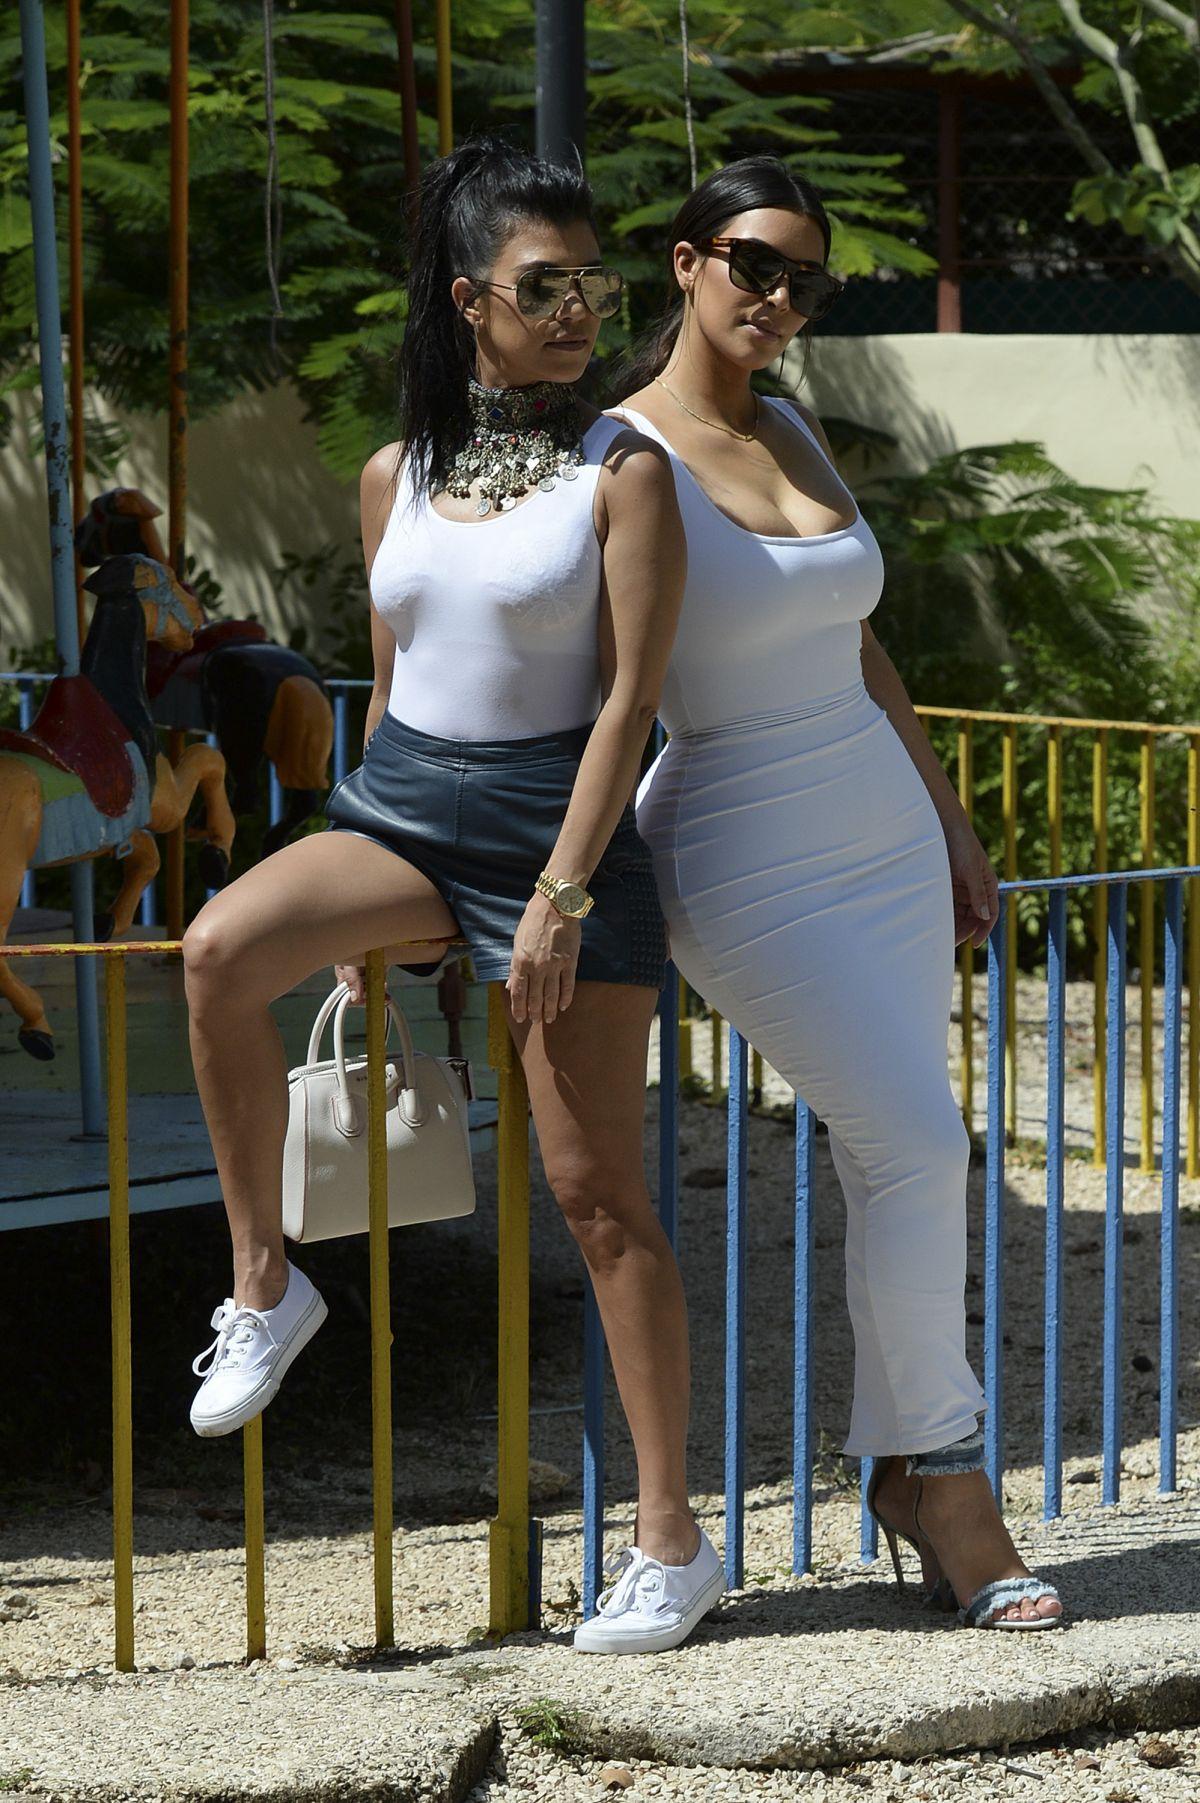 KIM and KOURTNEY KARDASHIAN at a Park in Havana 05/05/2016